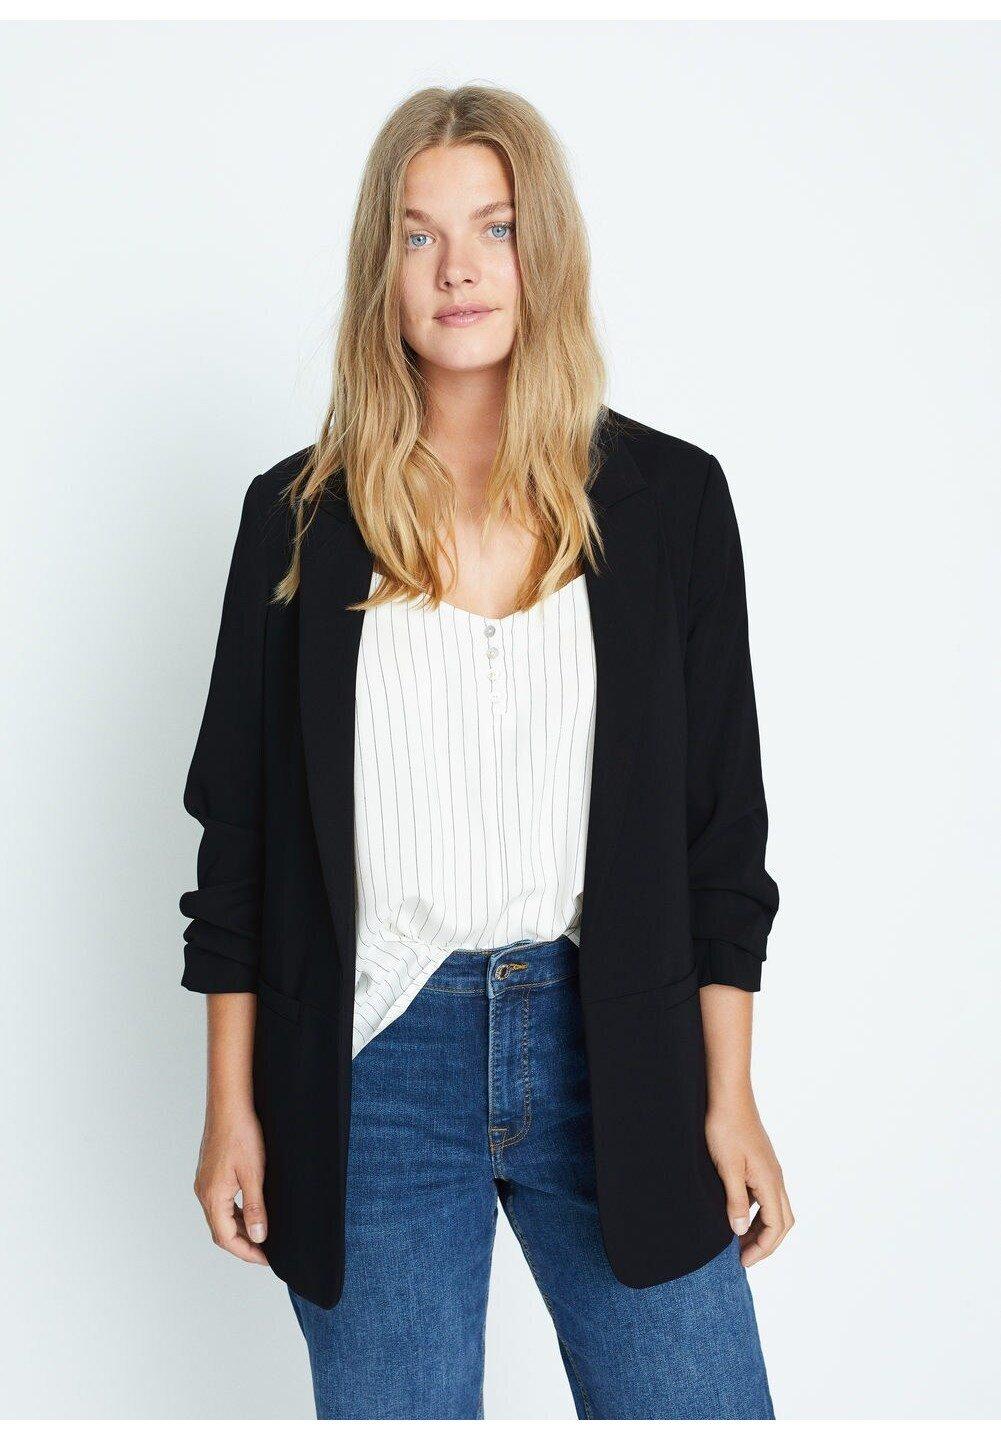 Shopping Women's Clothing Violeta by Mango FLOW7 Blazer dunkles marineblau wli3fZ5Gp